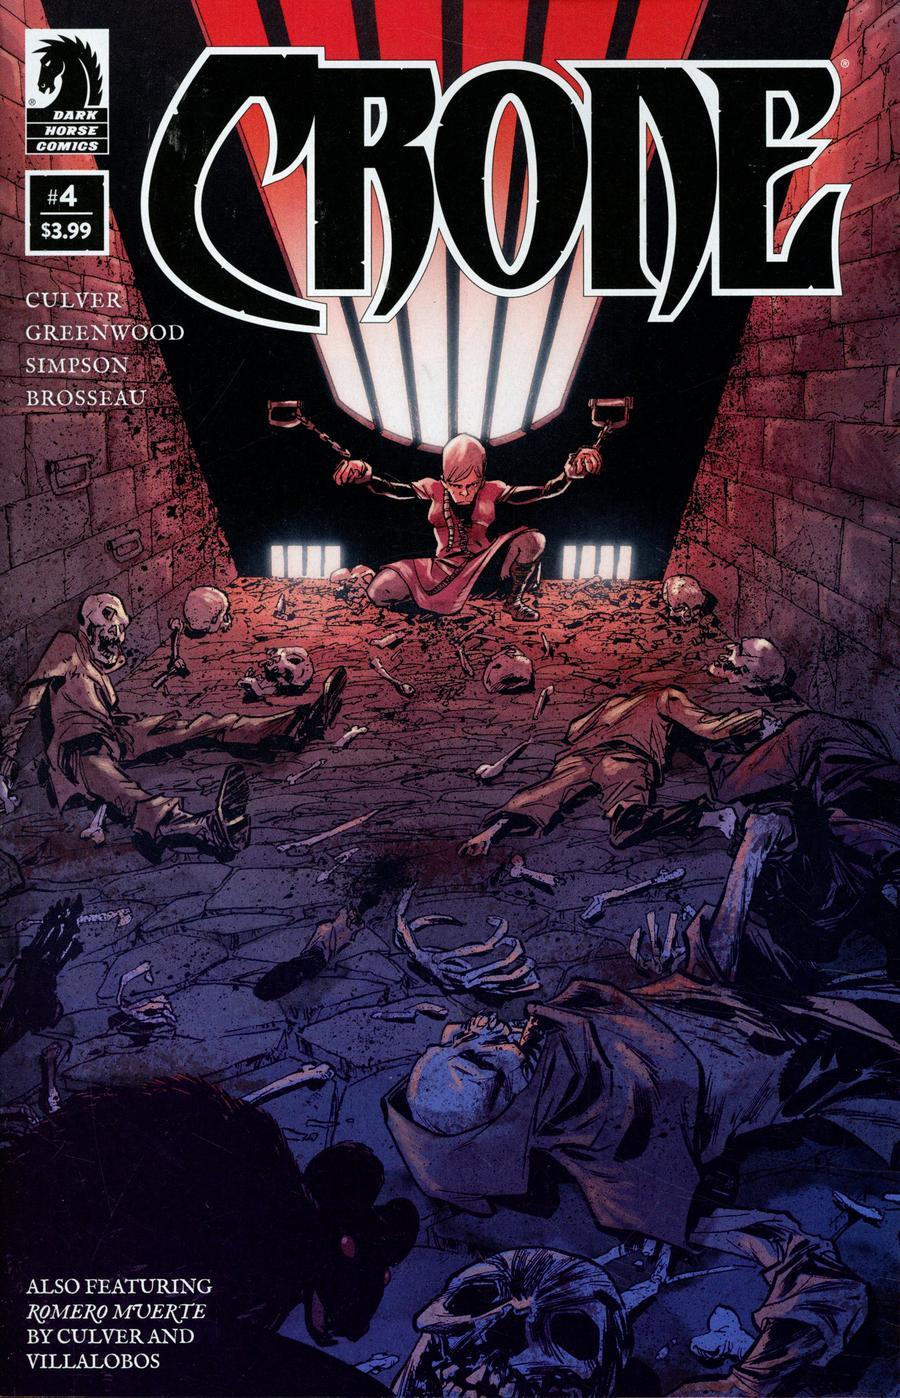 Crone #4